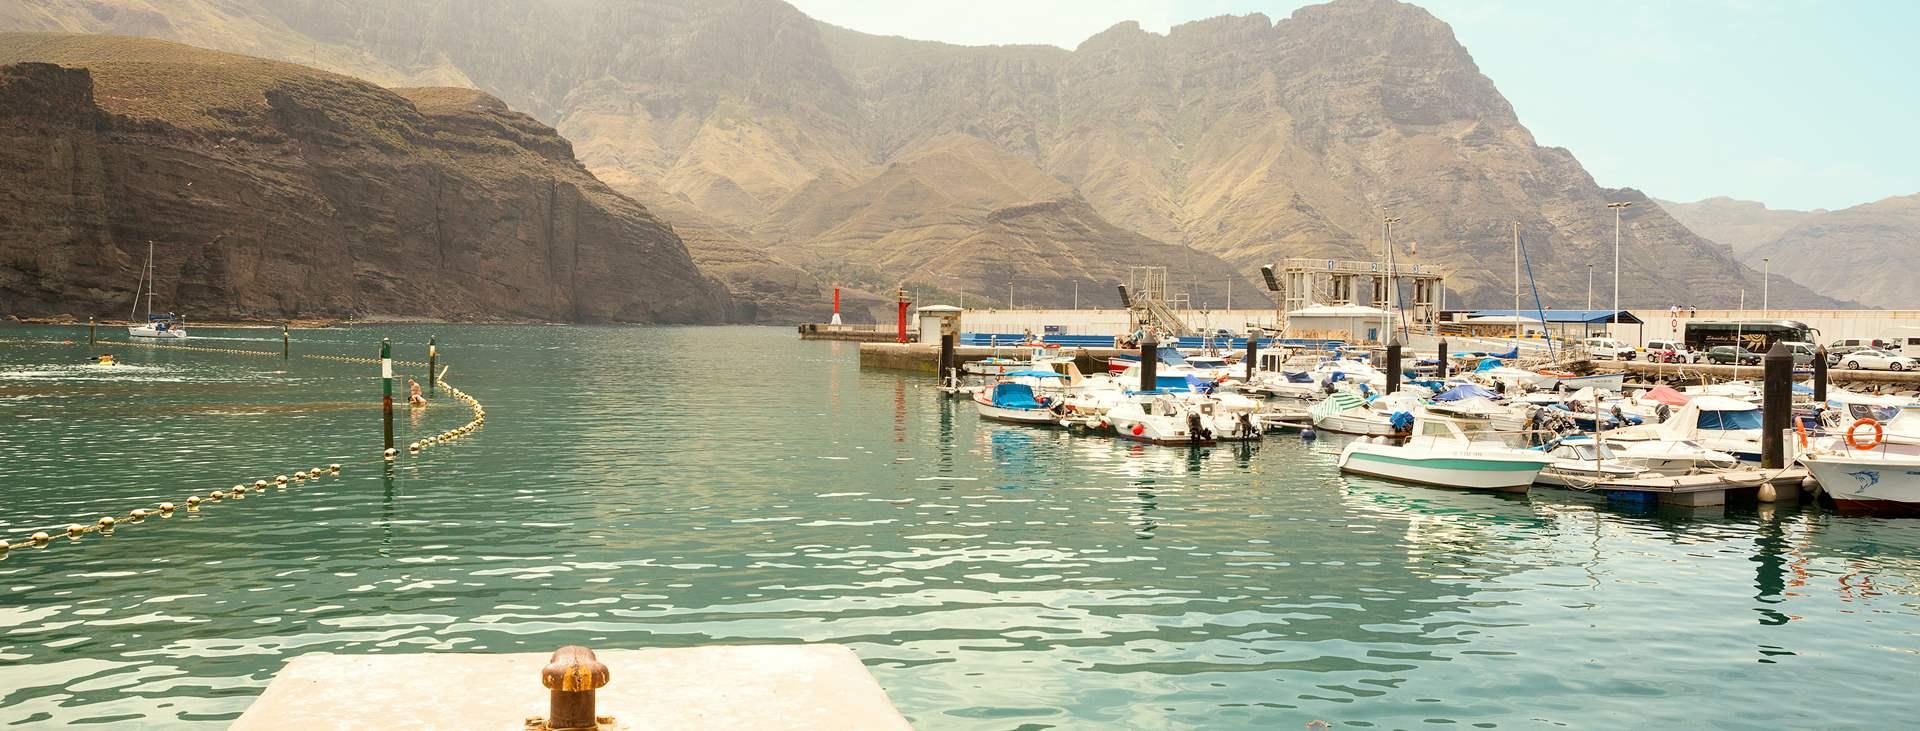 Bestill en reise til Agaete på Gran Canaria med Ving